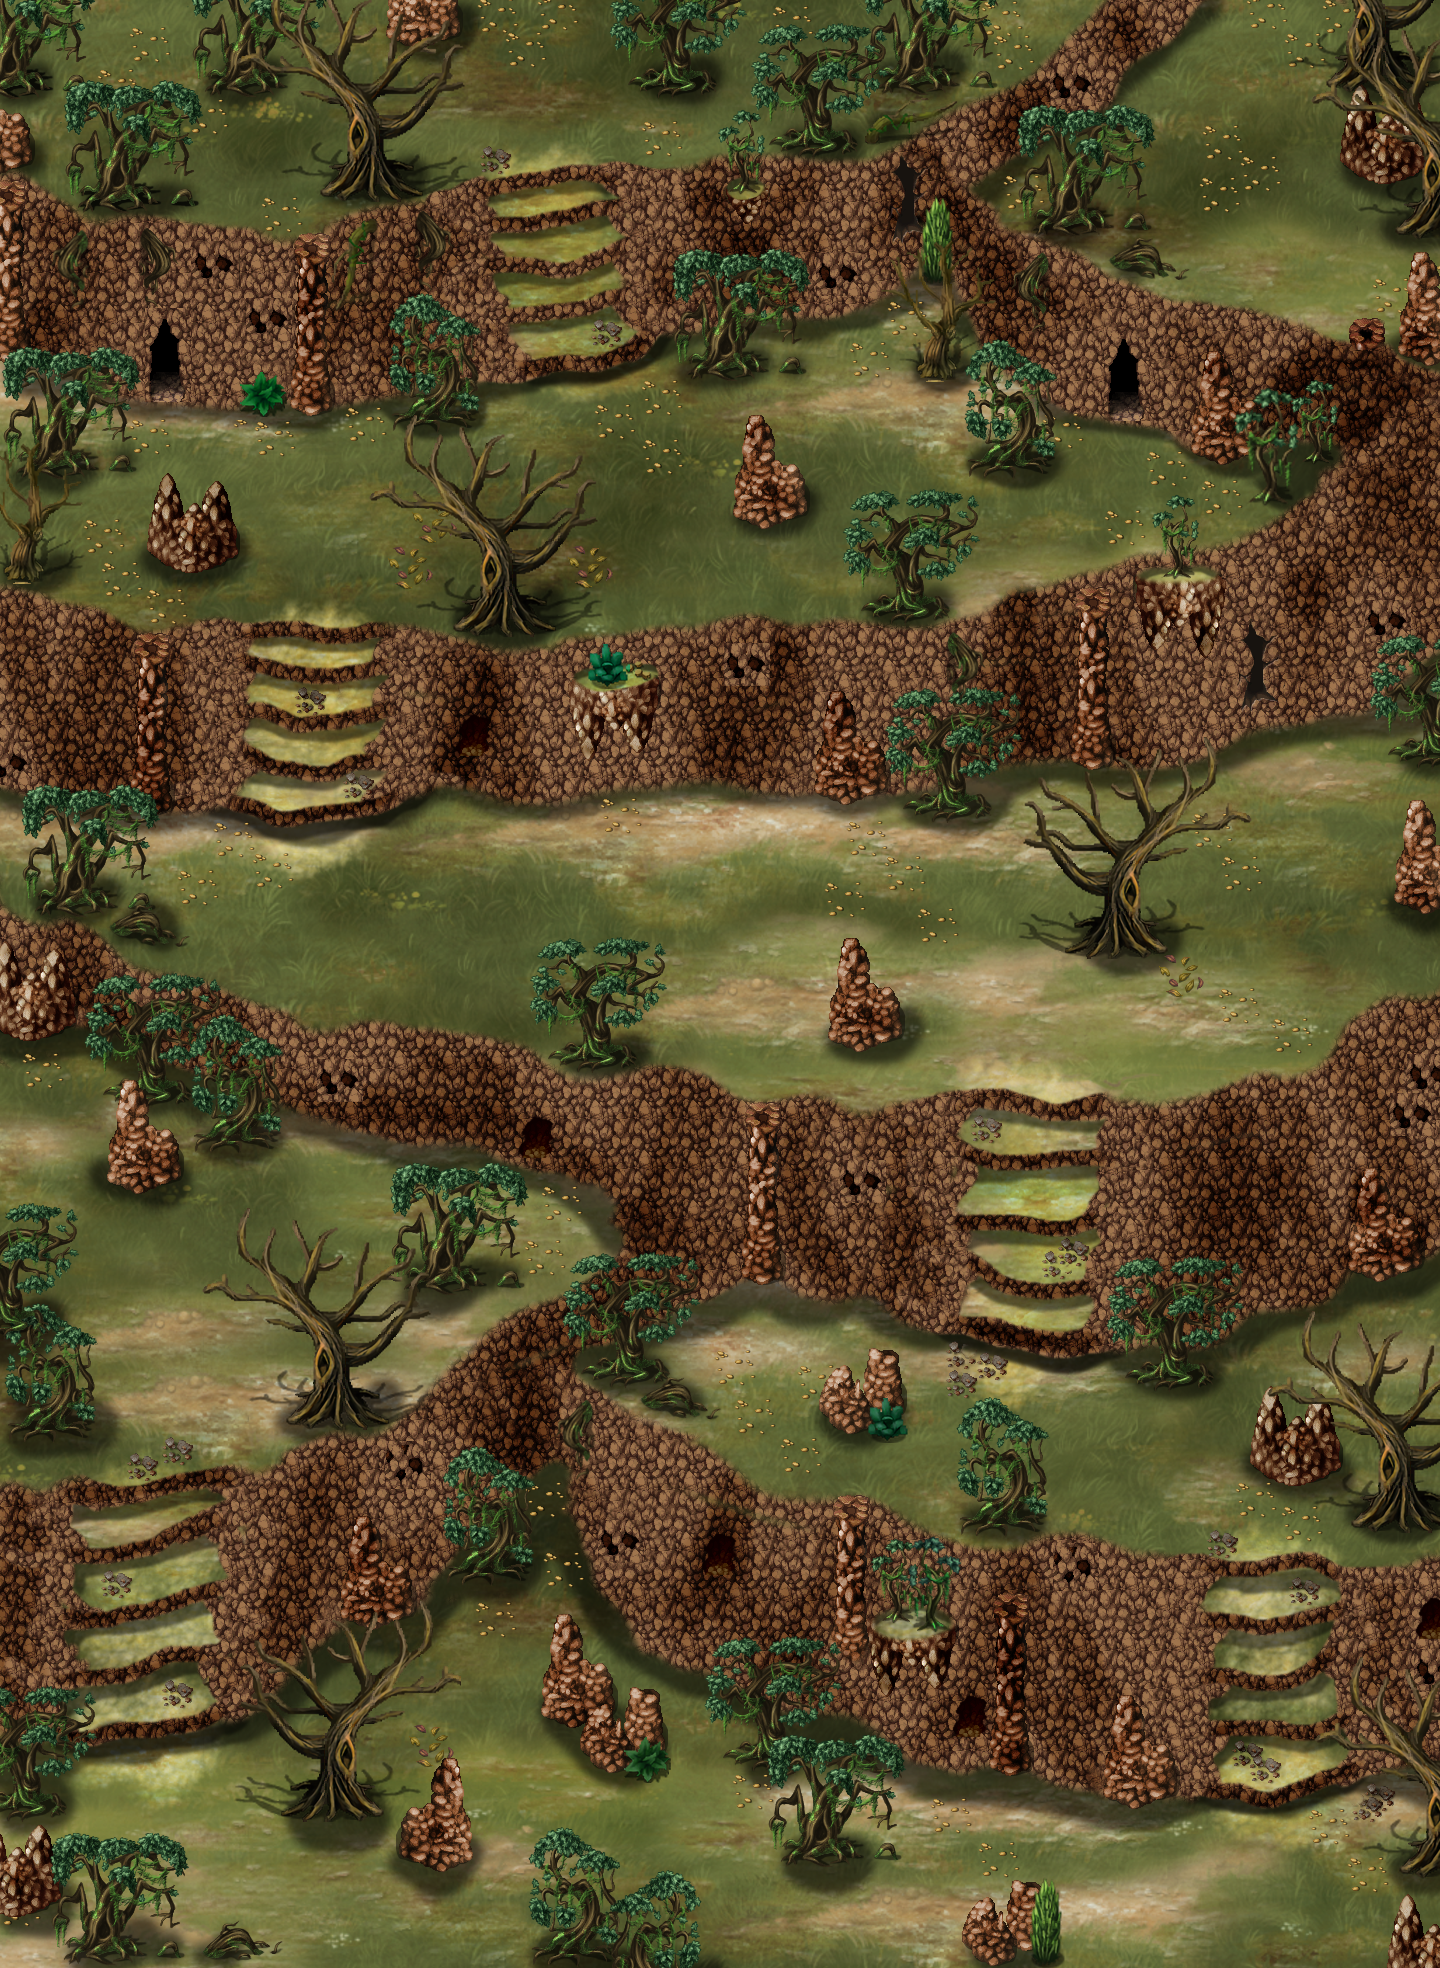 Screenshot de vos projets - Page 16 Donjon-falaise-aride